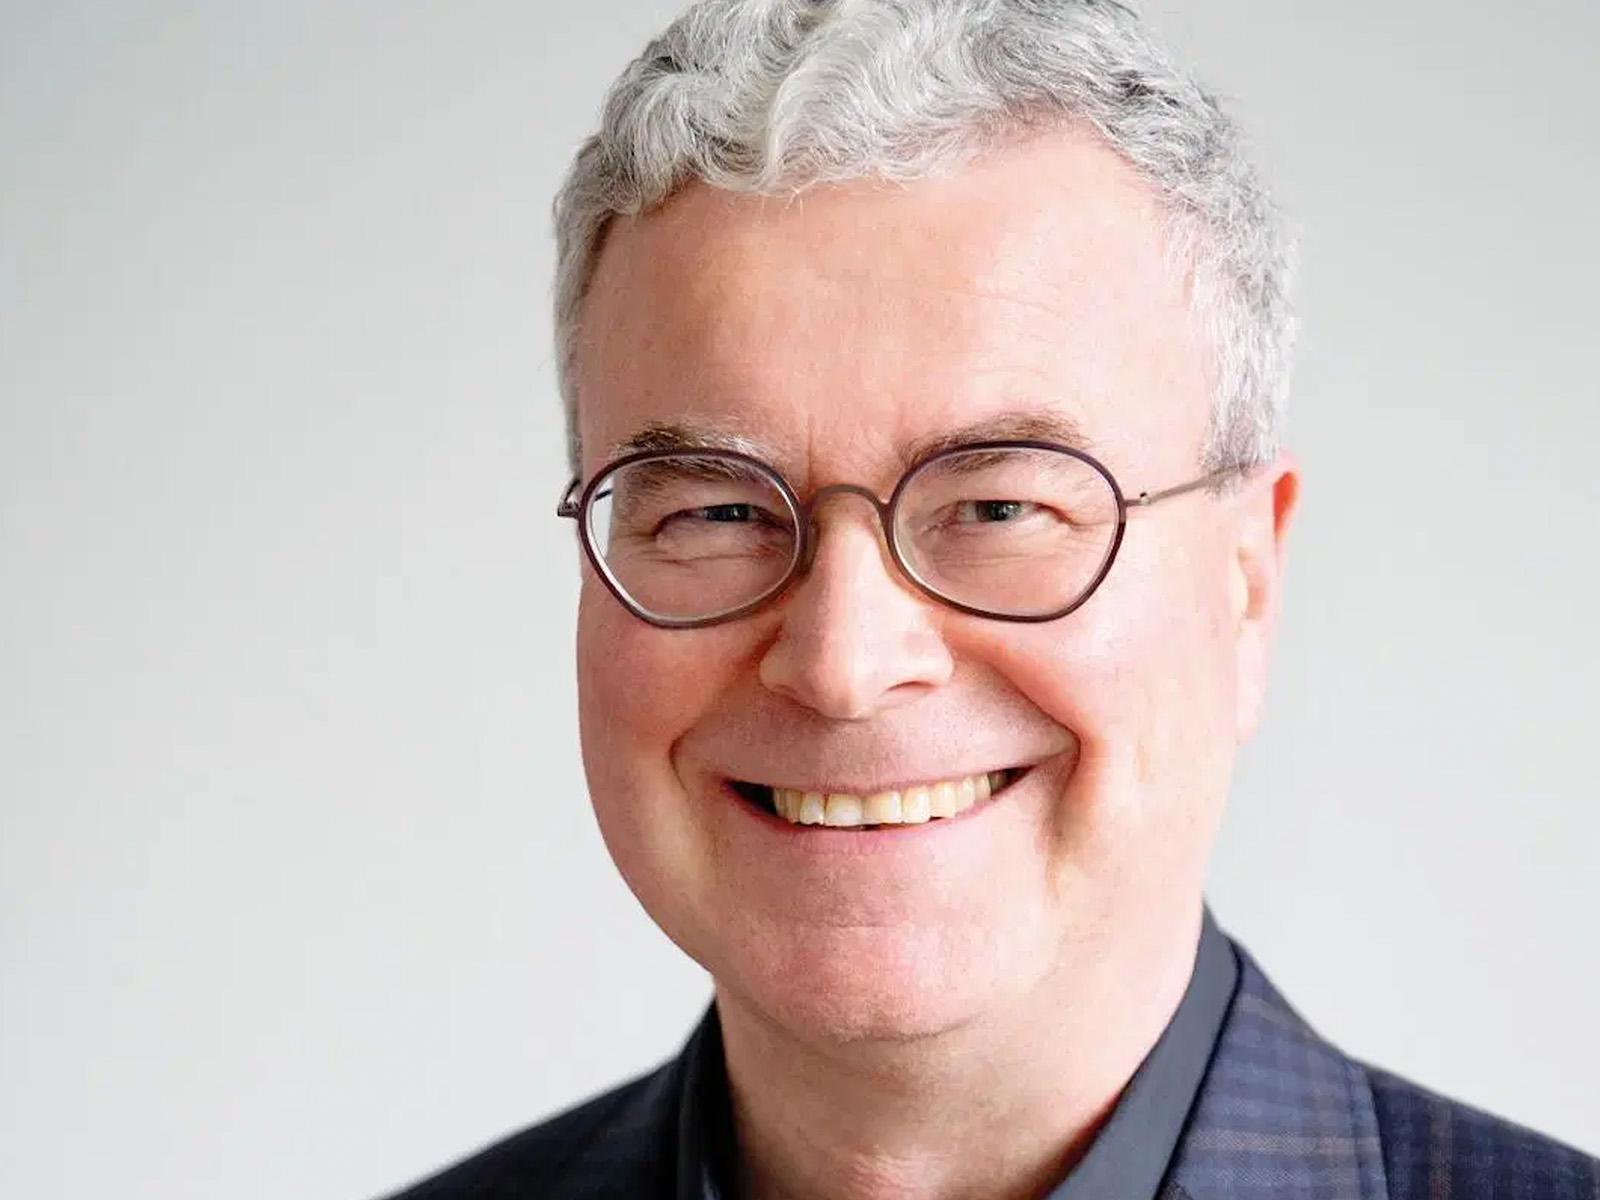 Martin Sirk on intellectual capital